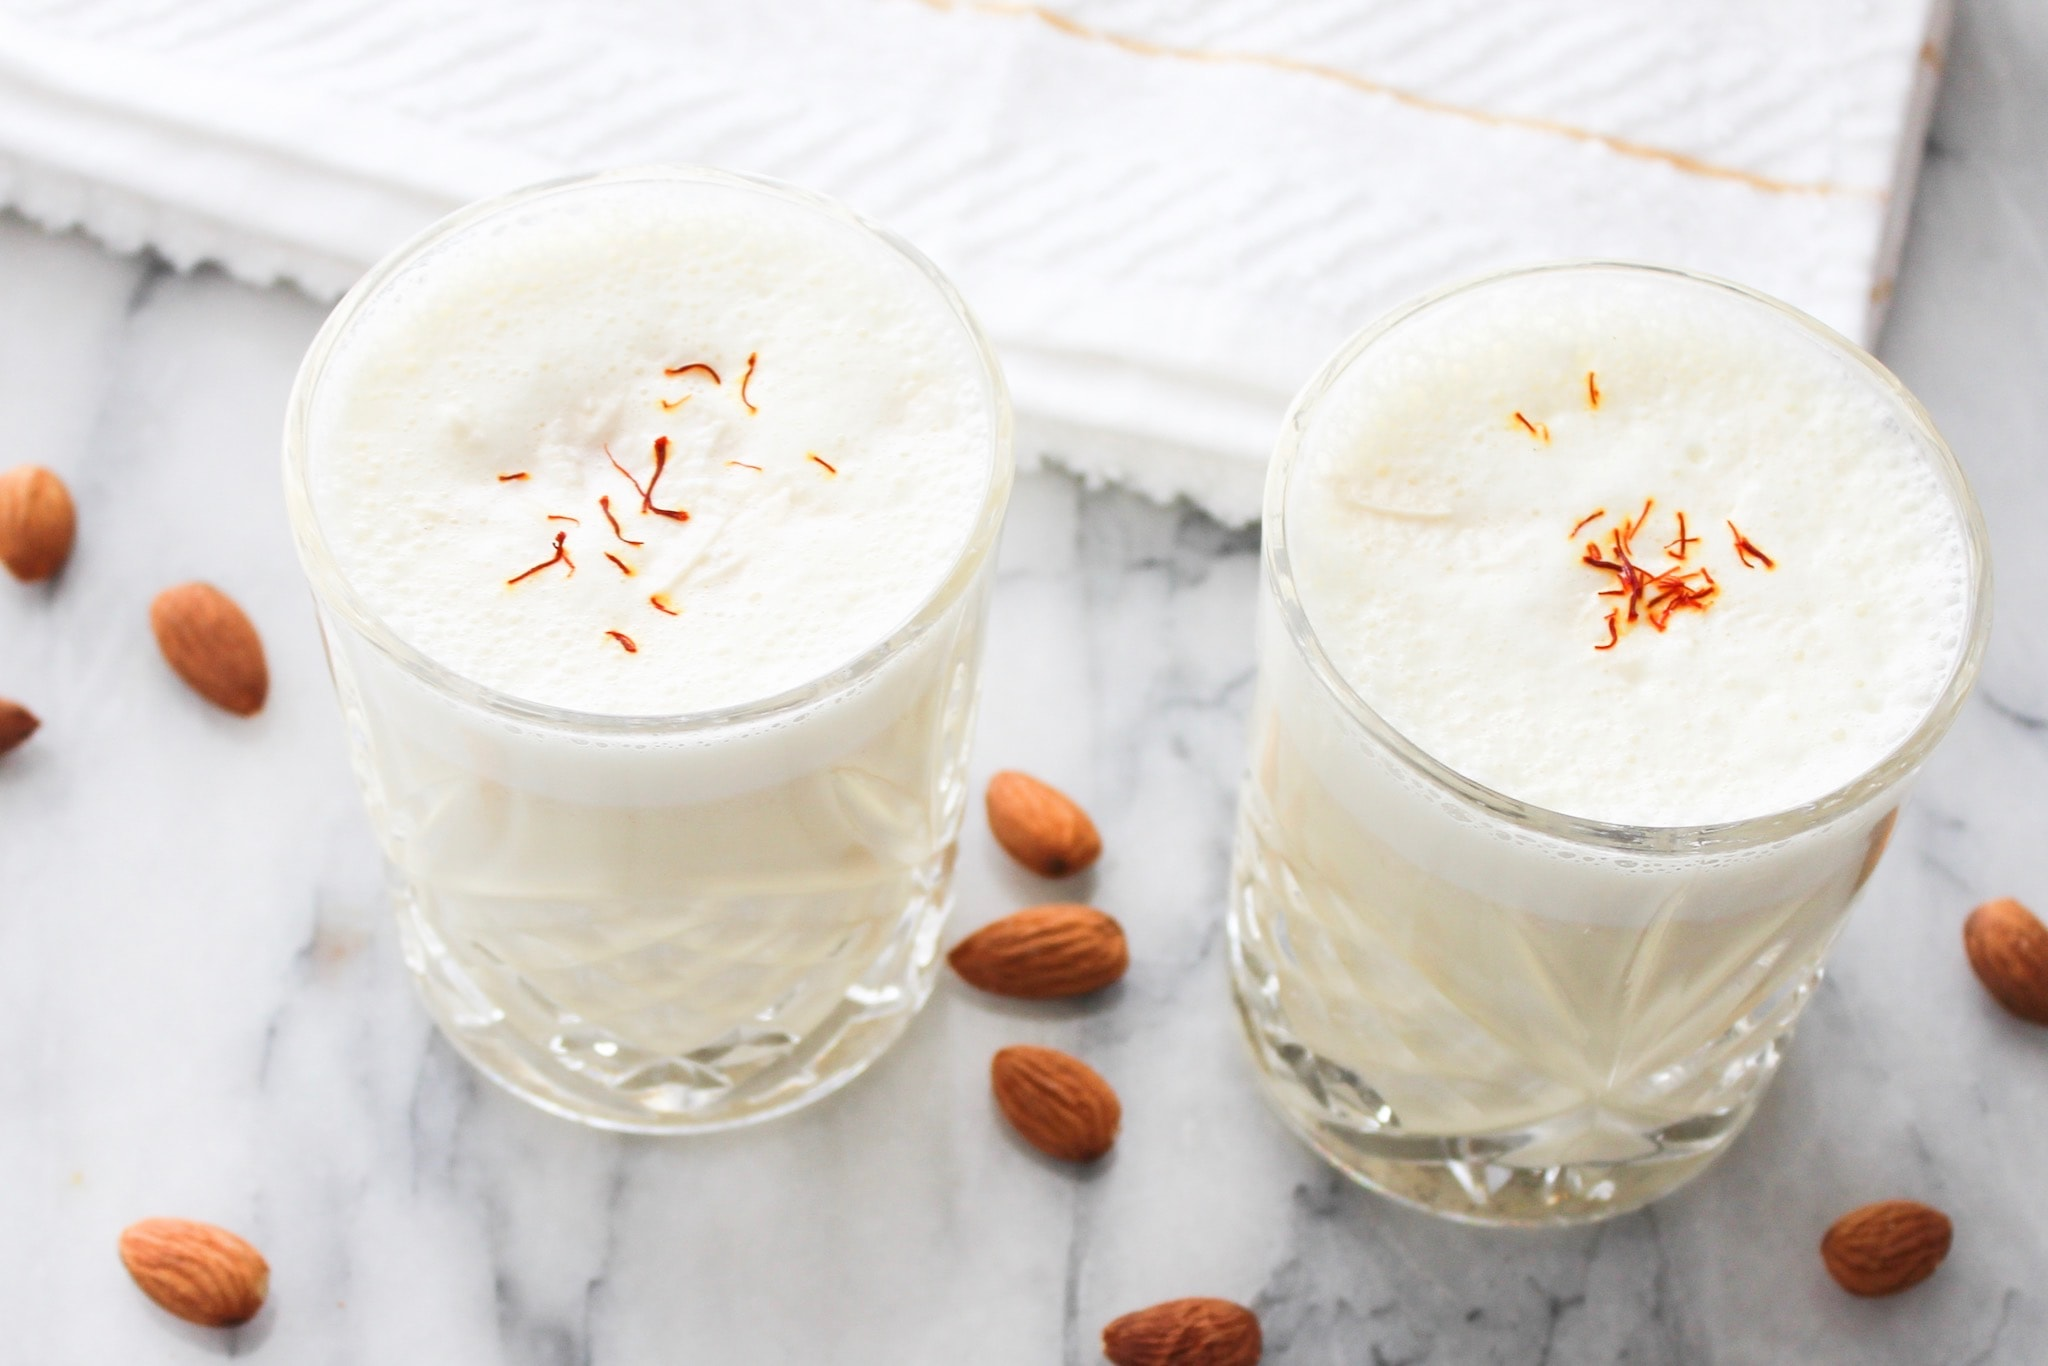 Almond and Saffron Milk